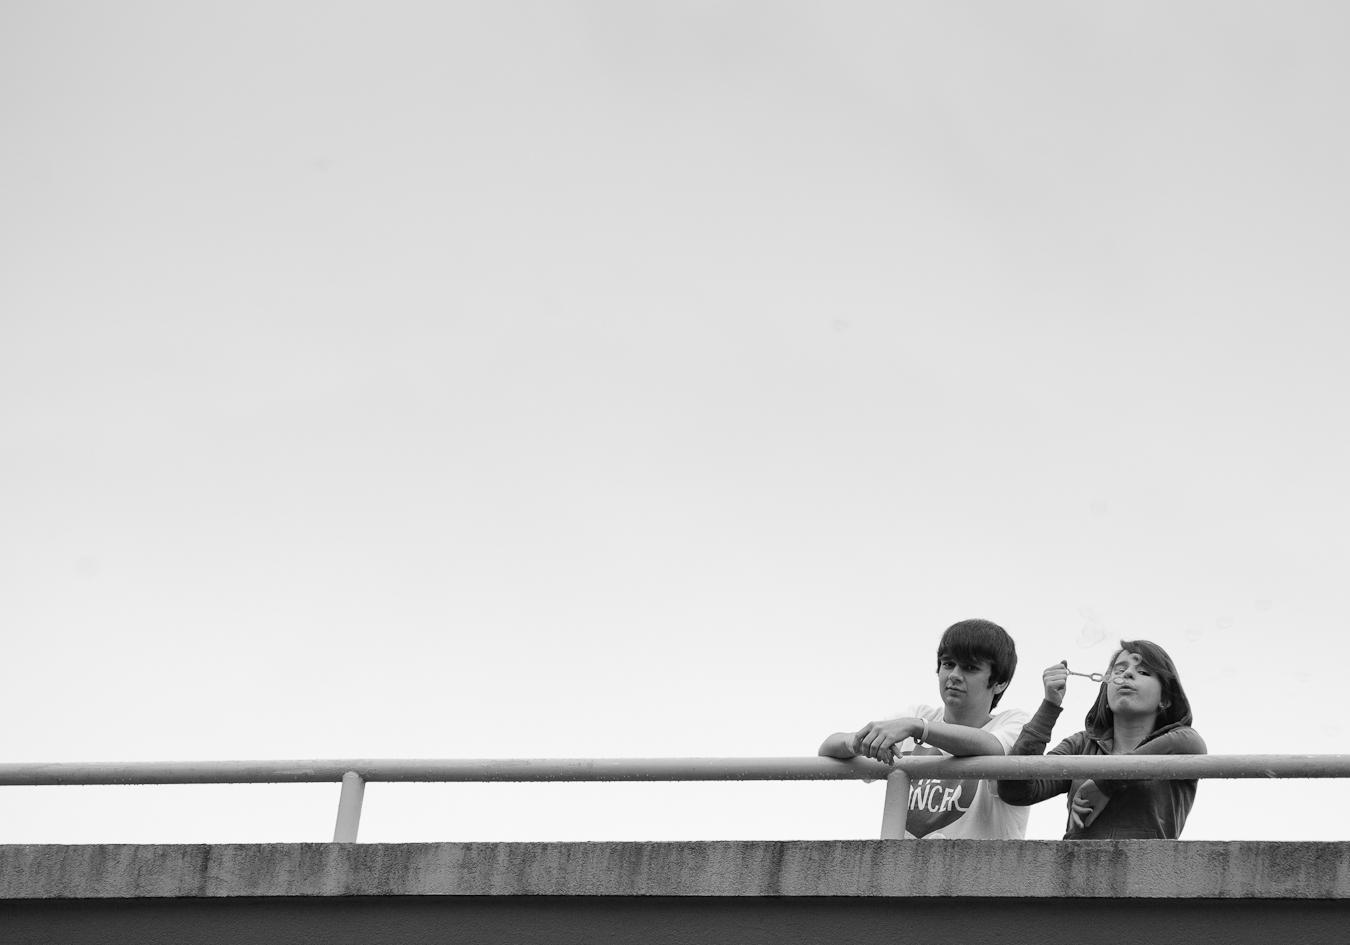 Bubble Blowers, shot by D. EDWARDS